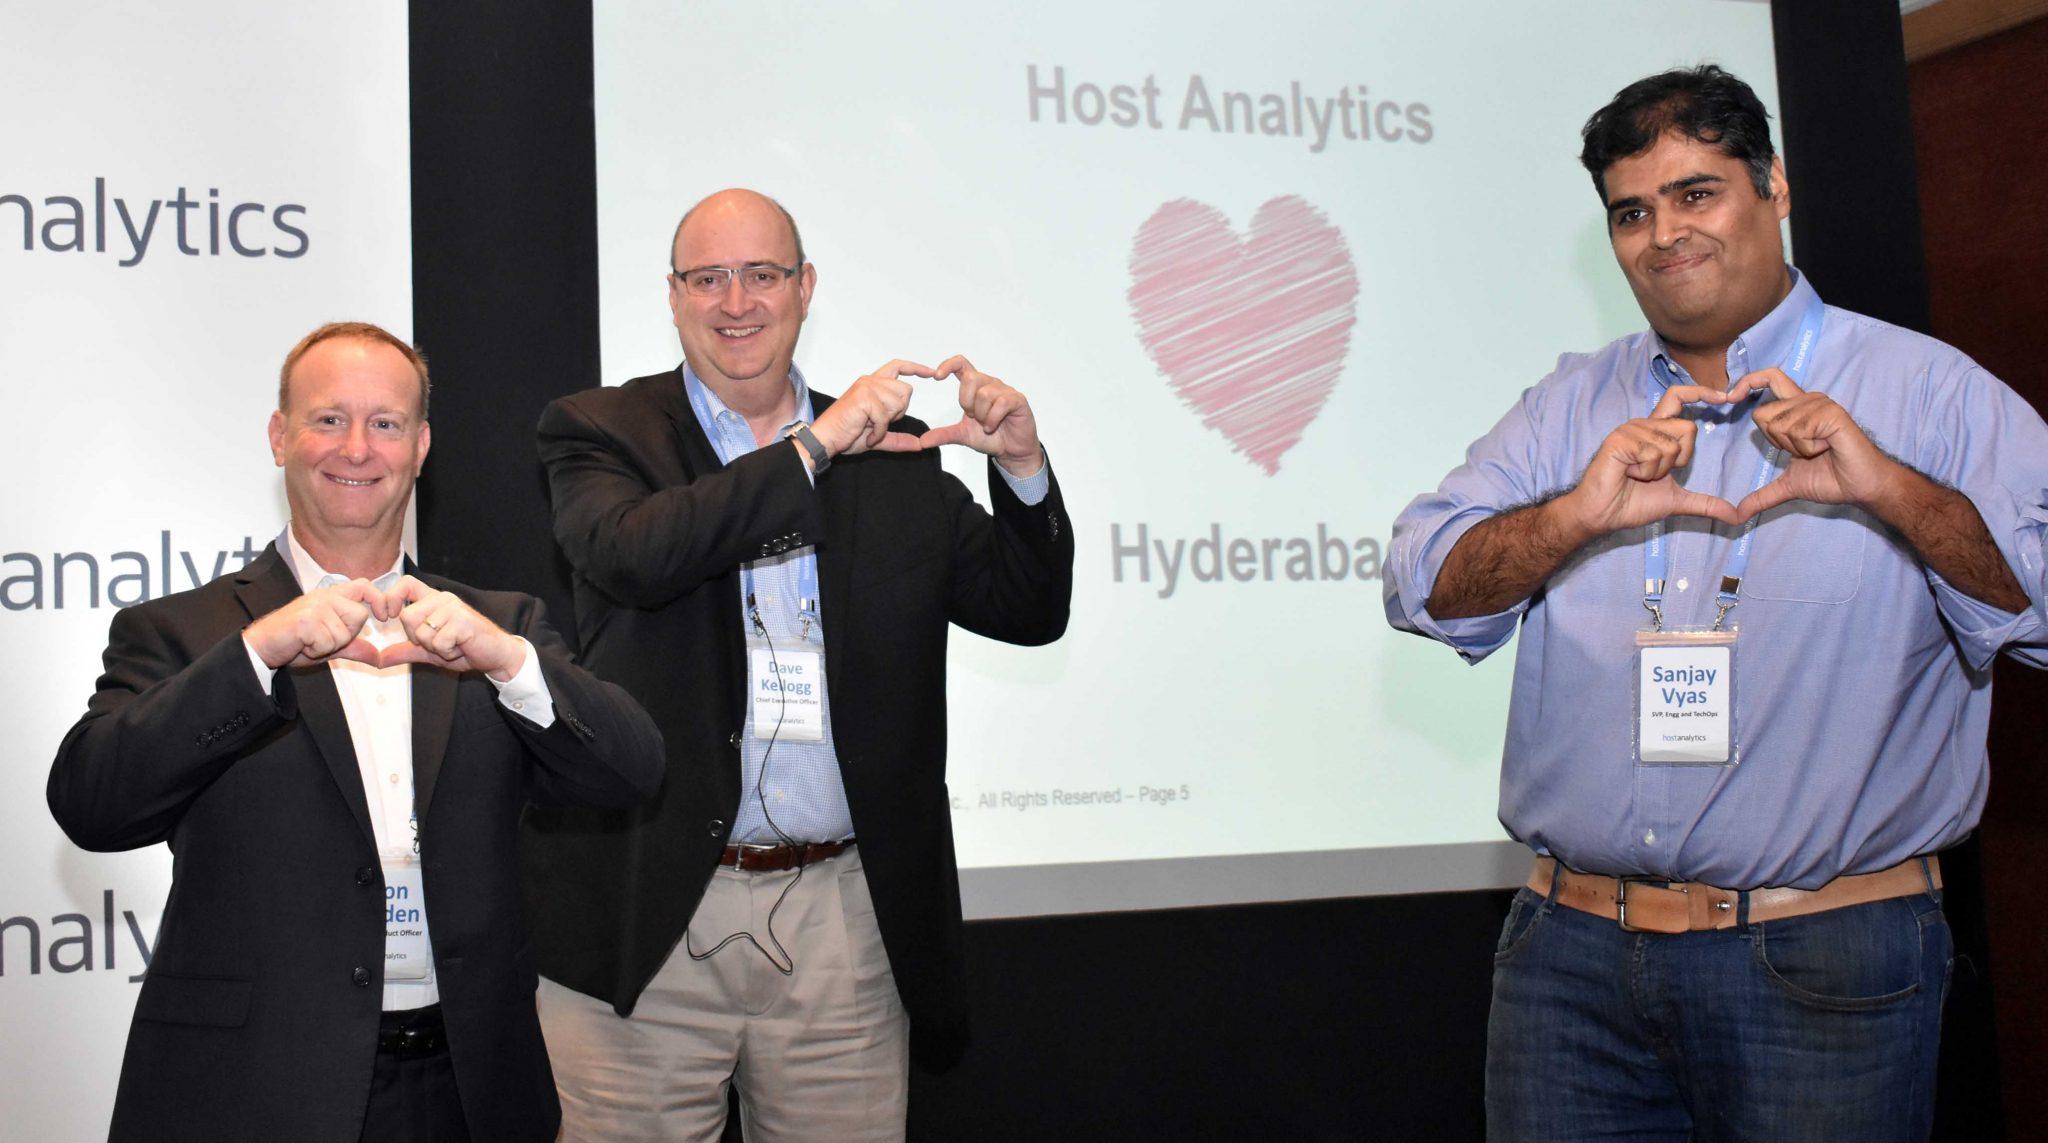 Ron Baden, Dave Kellogg, Sanjay Vyas of Host Analytics--pic 8